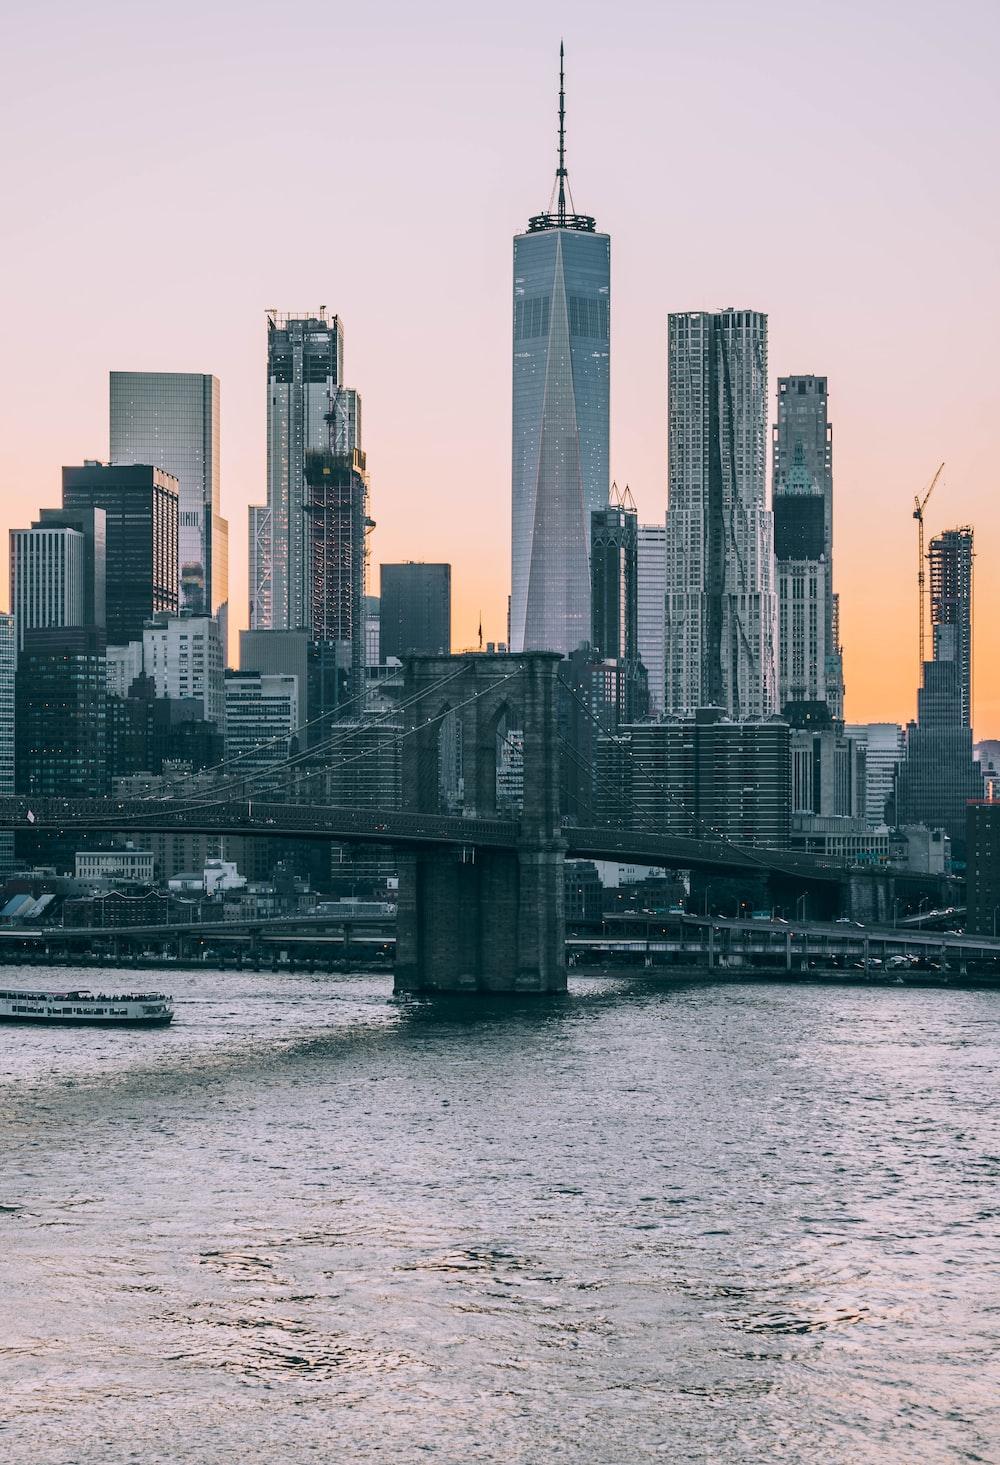 Brooklyn Bridge, New York during daytime